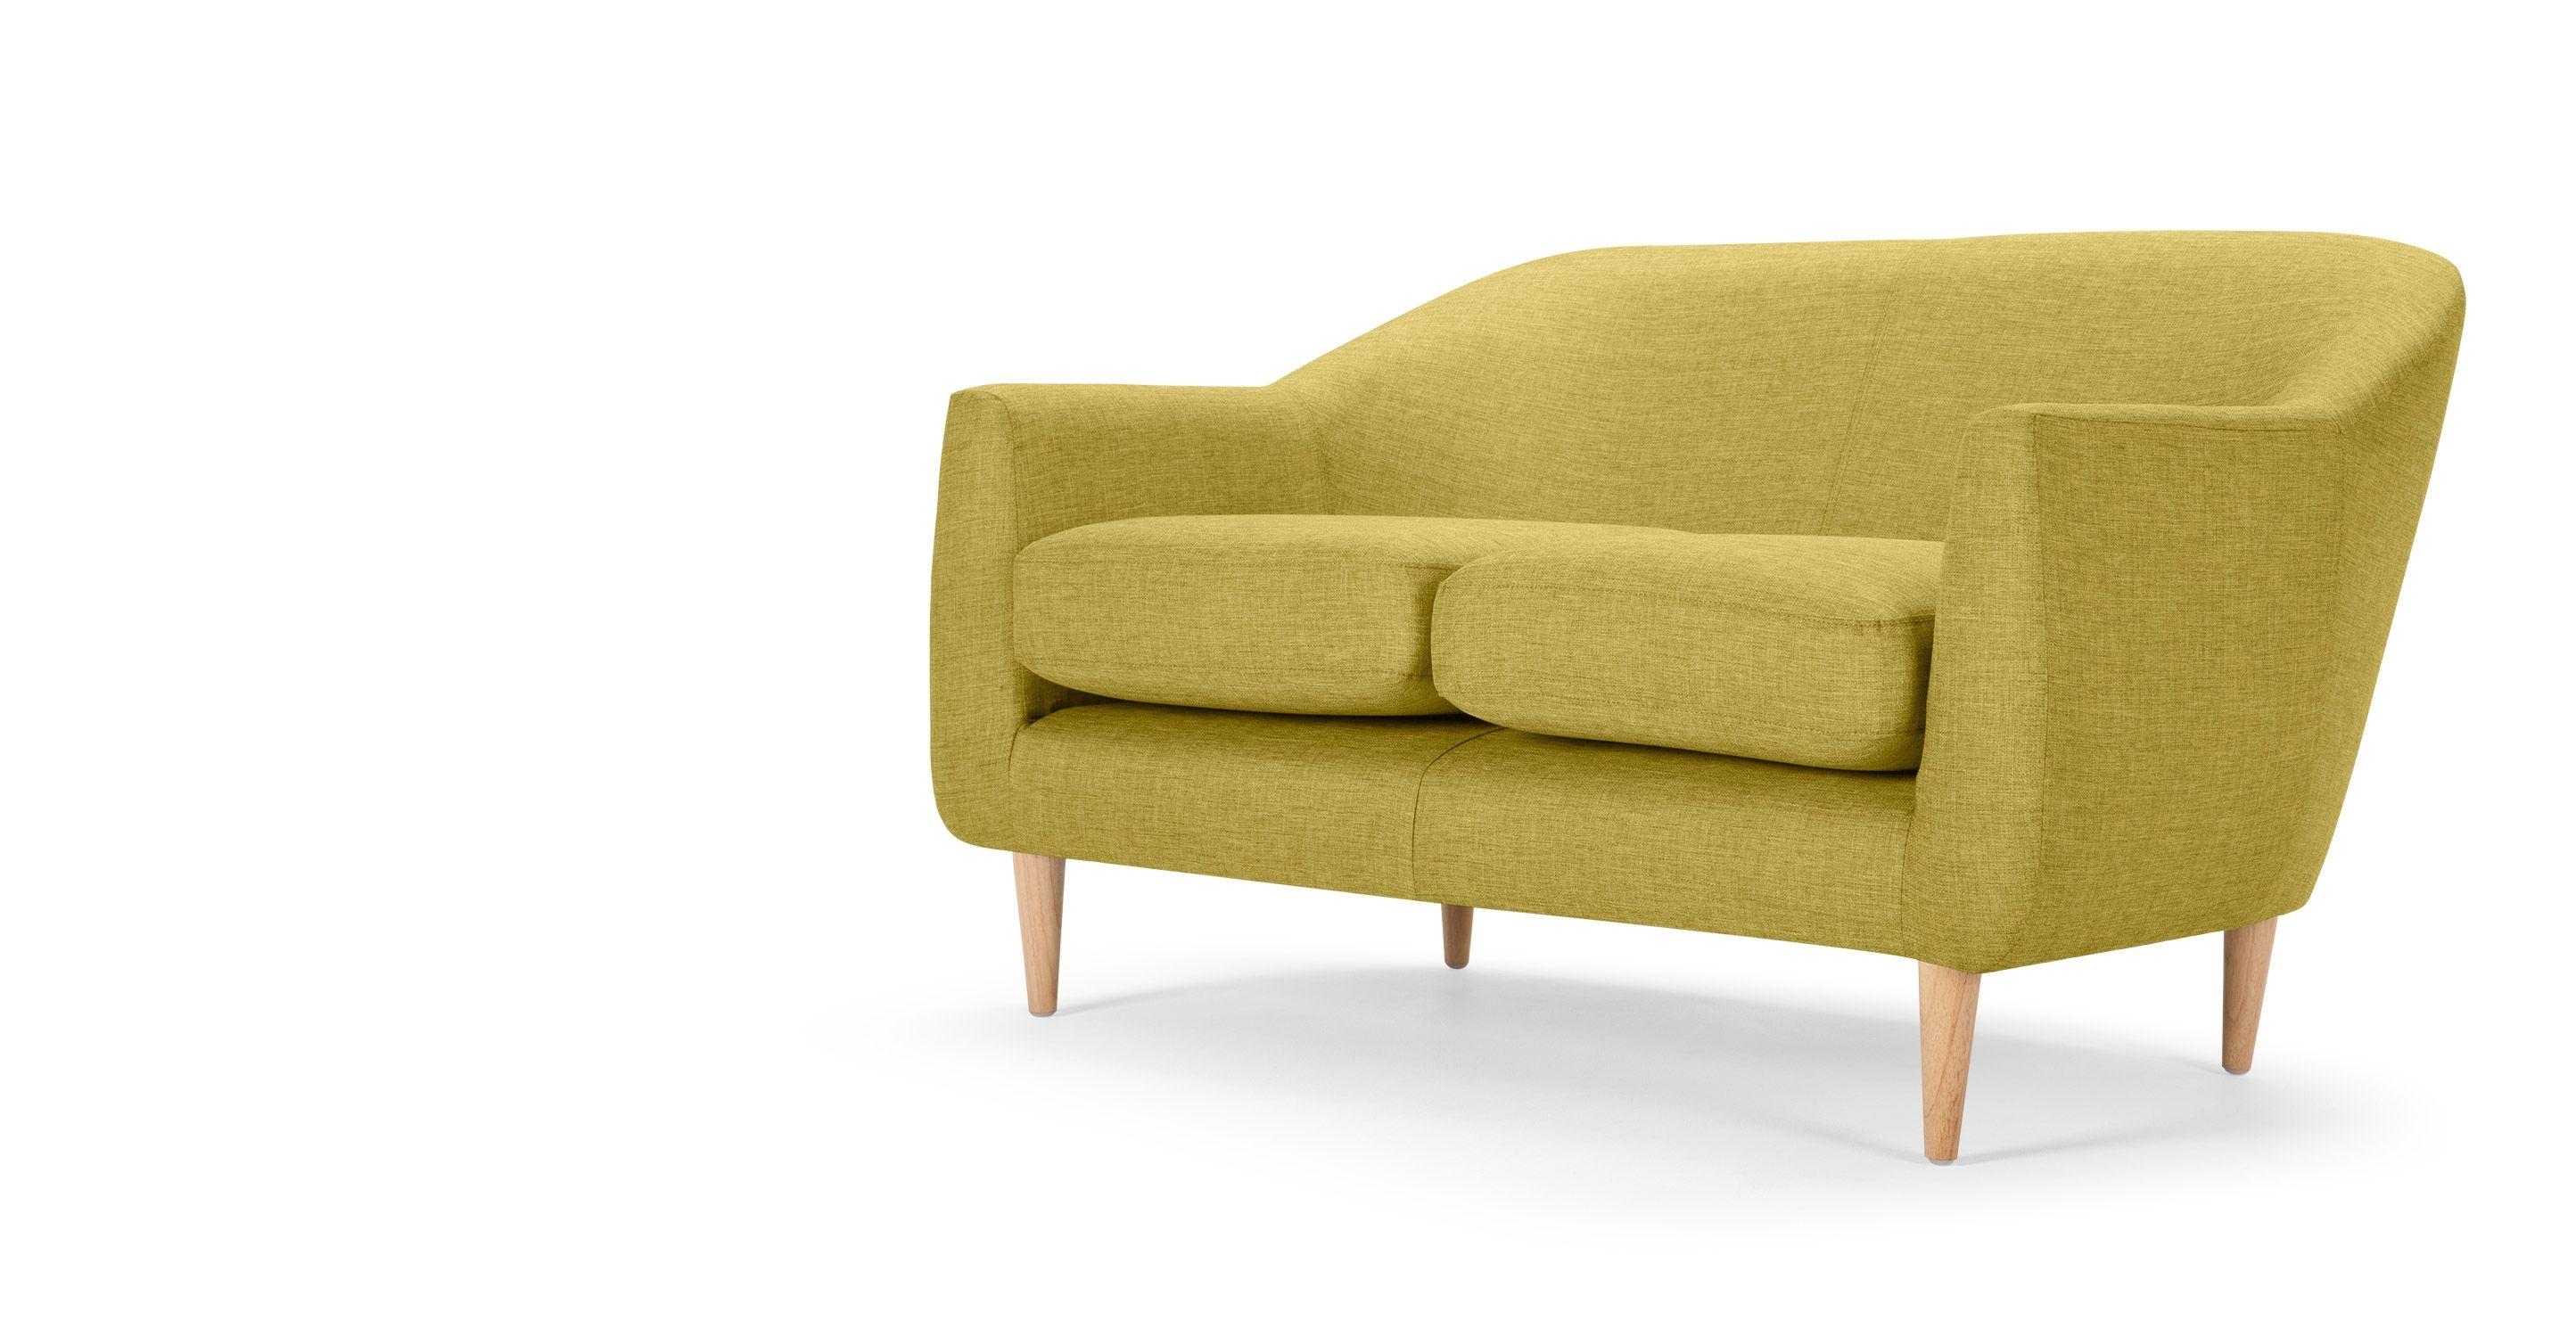 Extravagant Modern Minimalist Yellow Sofas Wooden Style Frame With